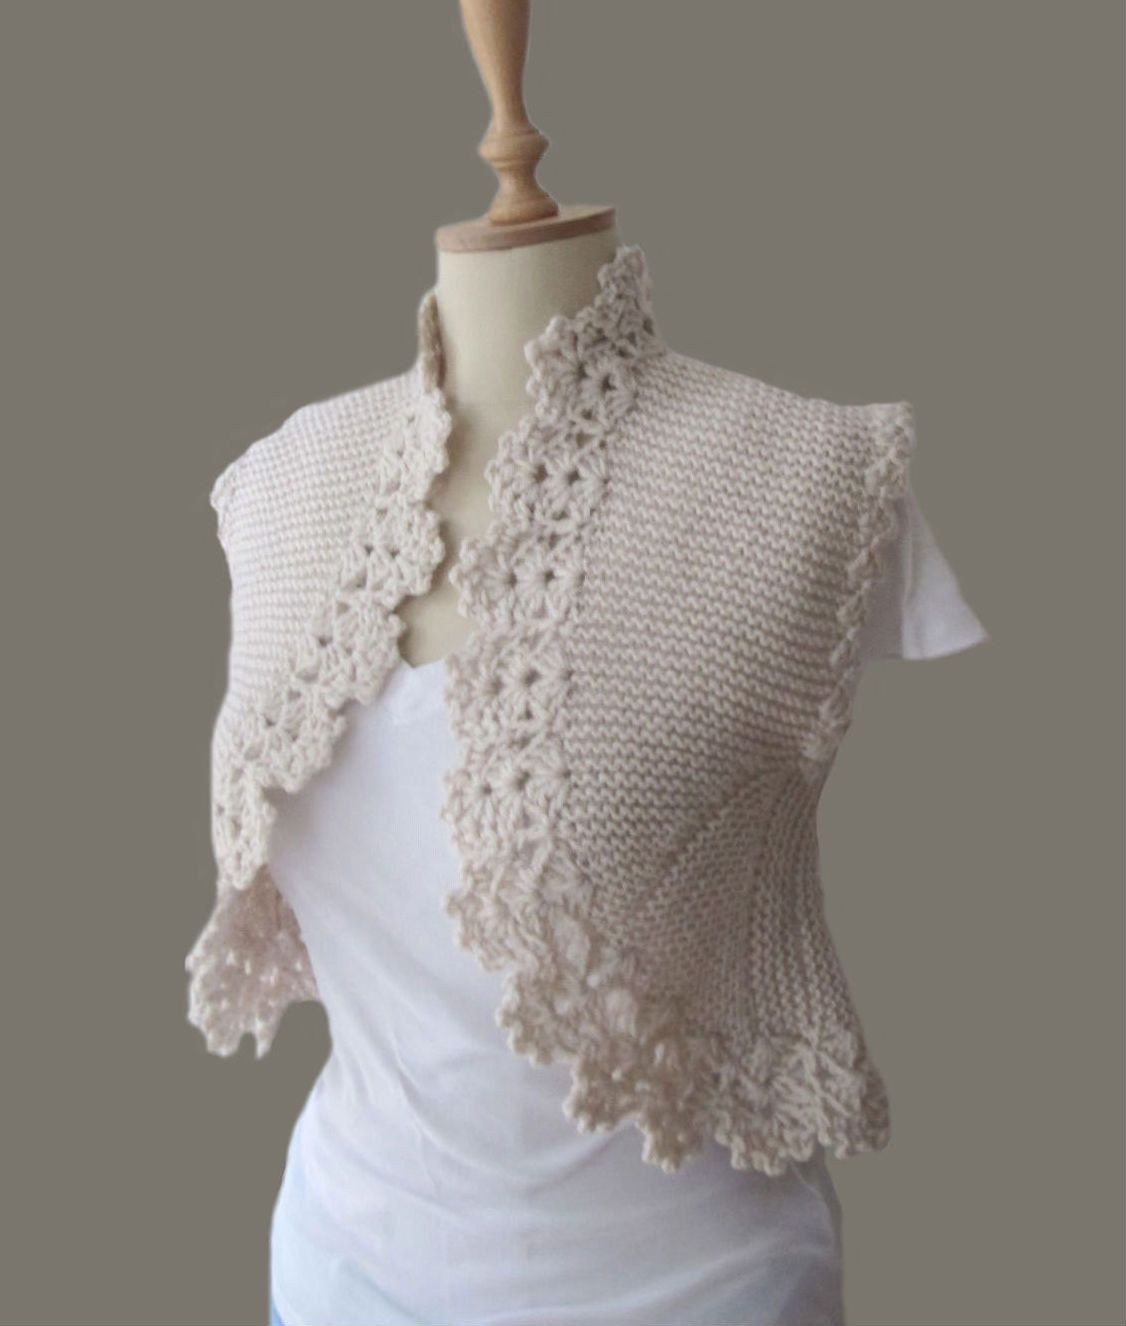 wedding shawl | Manualidades | Pinterest | Amigos y Cosas